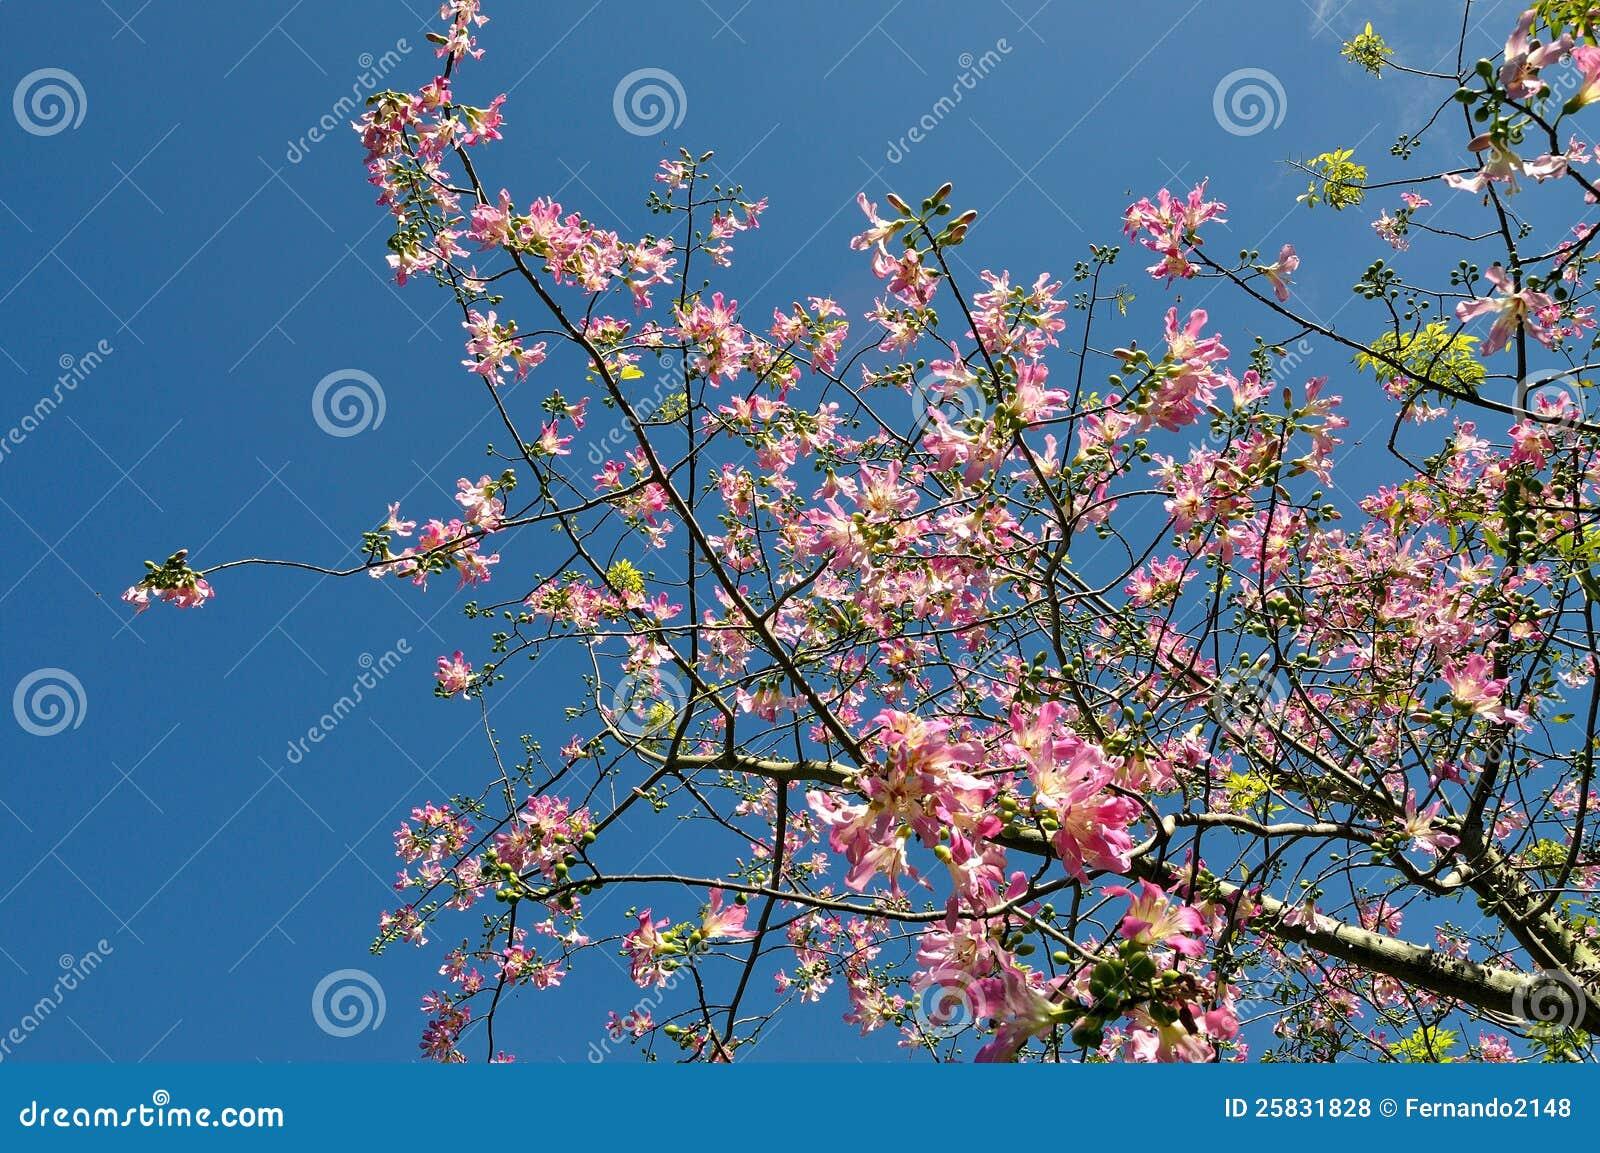 Flowering Silk Floss Tree Stock Photo Image Of Silk 25831828